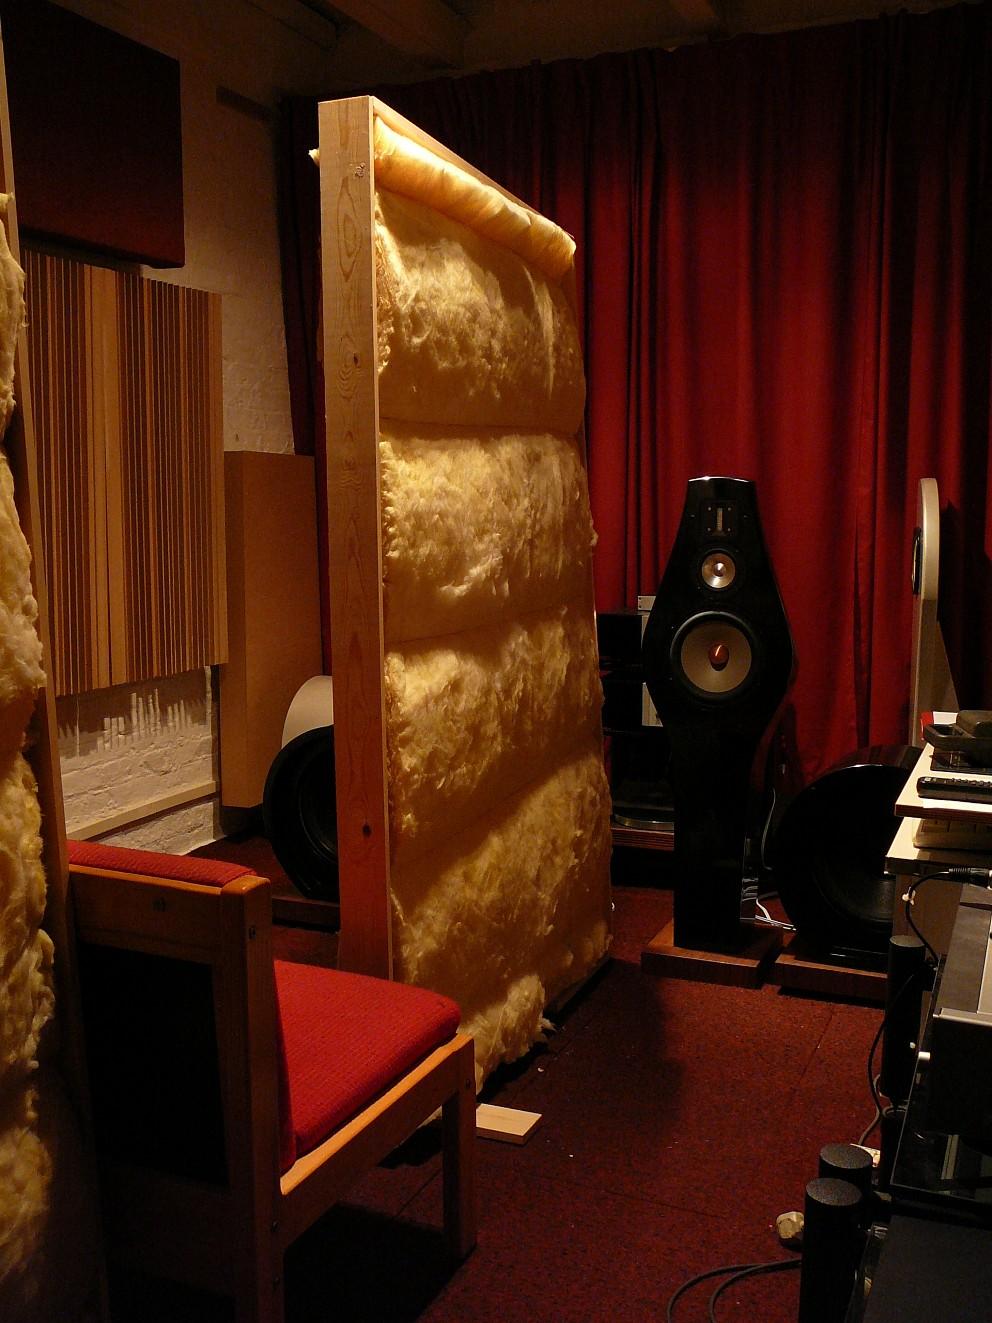 Recording Studio Sound Proofing Cubicle Dannychesnut Com